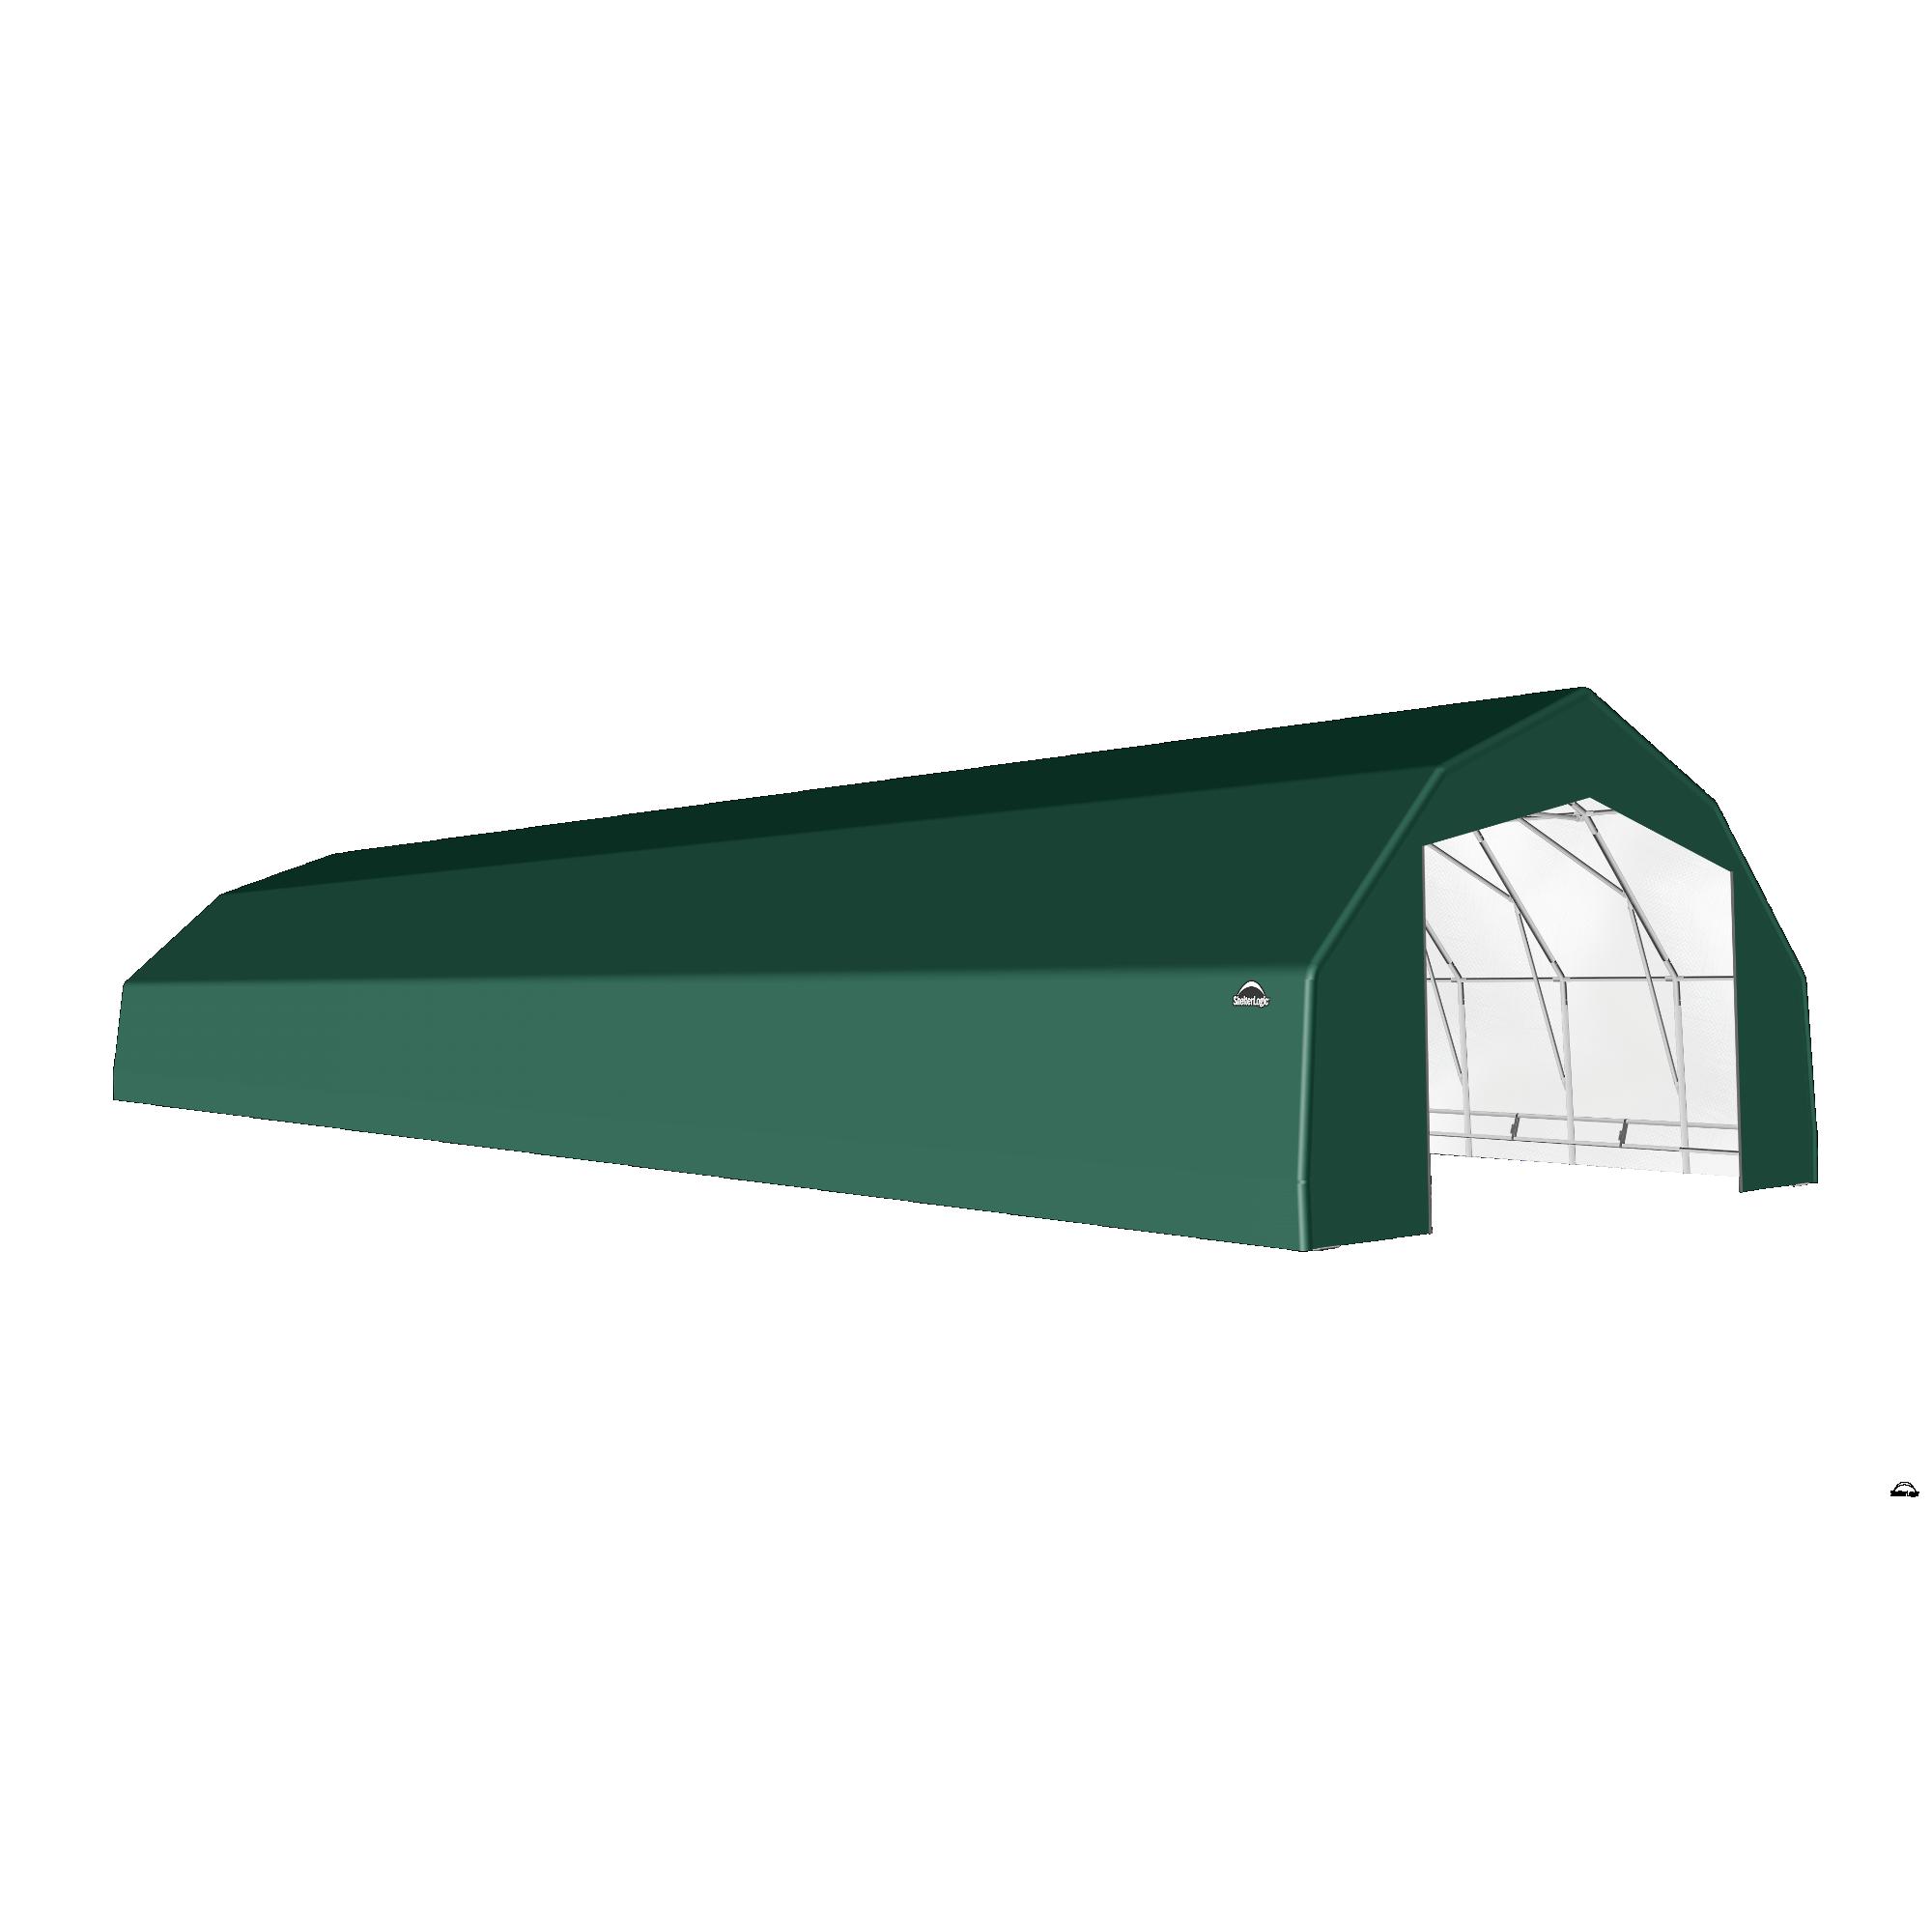 SP Barn 25X76X14 Green 14 oz PE Shelter